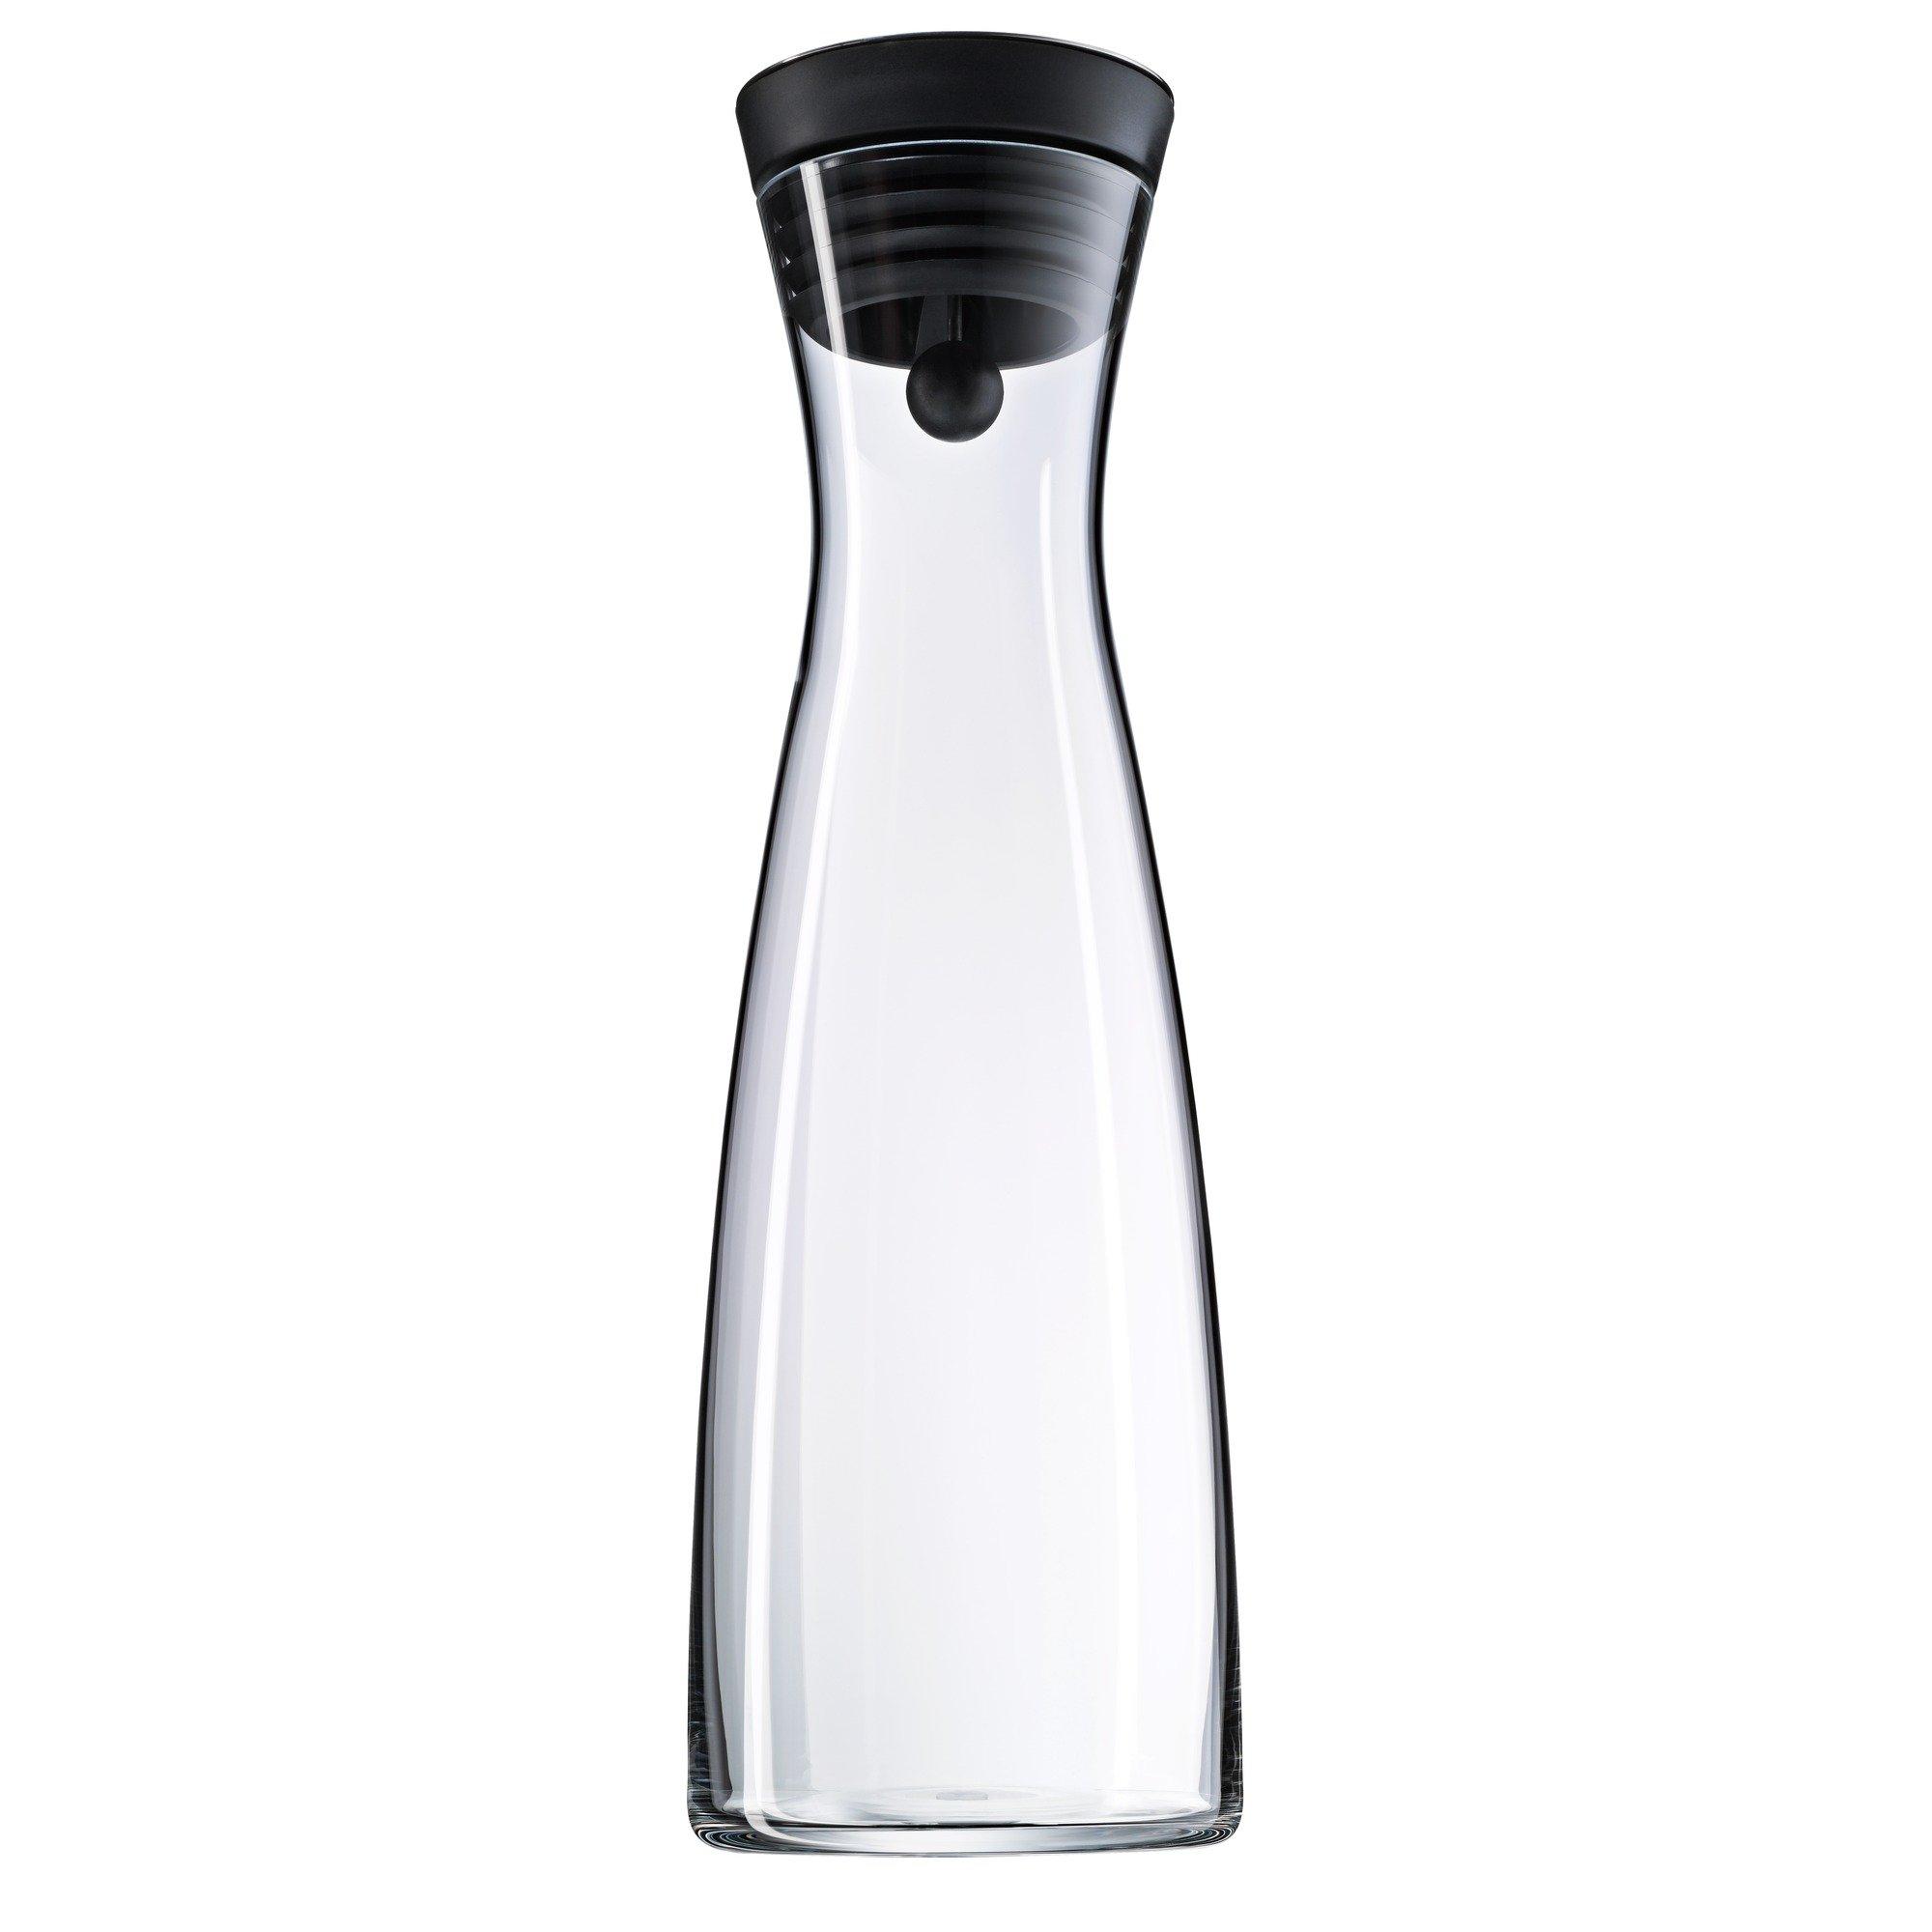 WMF Basic Water Carafe/Decanter 1.5l Black